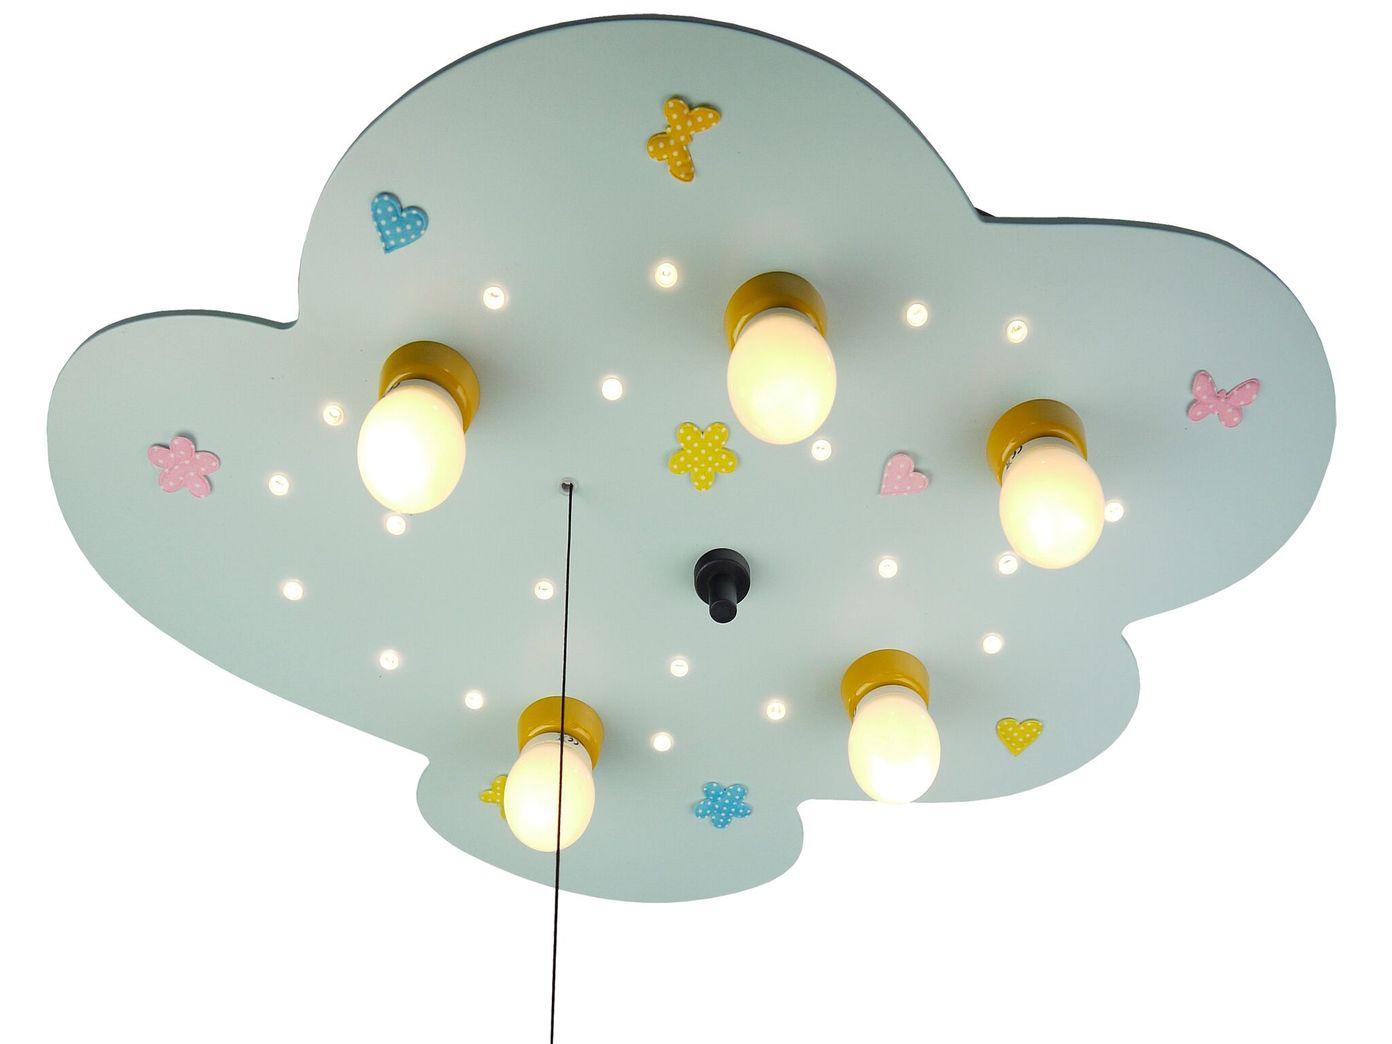 led deckenlampe f r kinderzimmer wolke amazon echo kompatibel led schlummerlicht eur 124 99. Black Bedroom Furniture Sets. Home Design Ideas